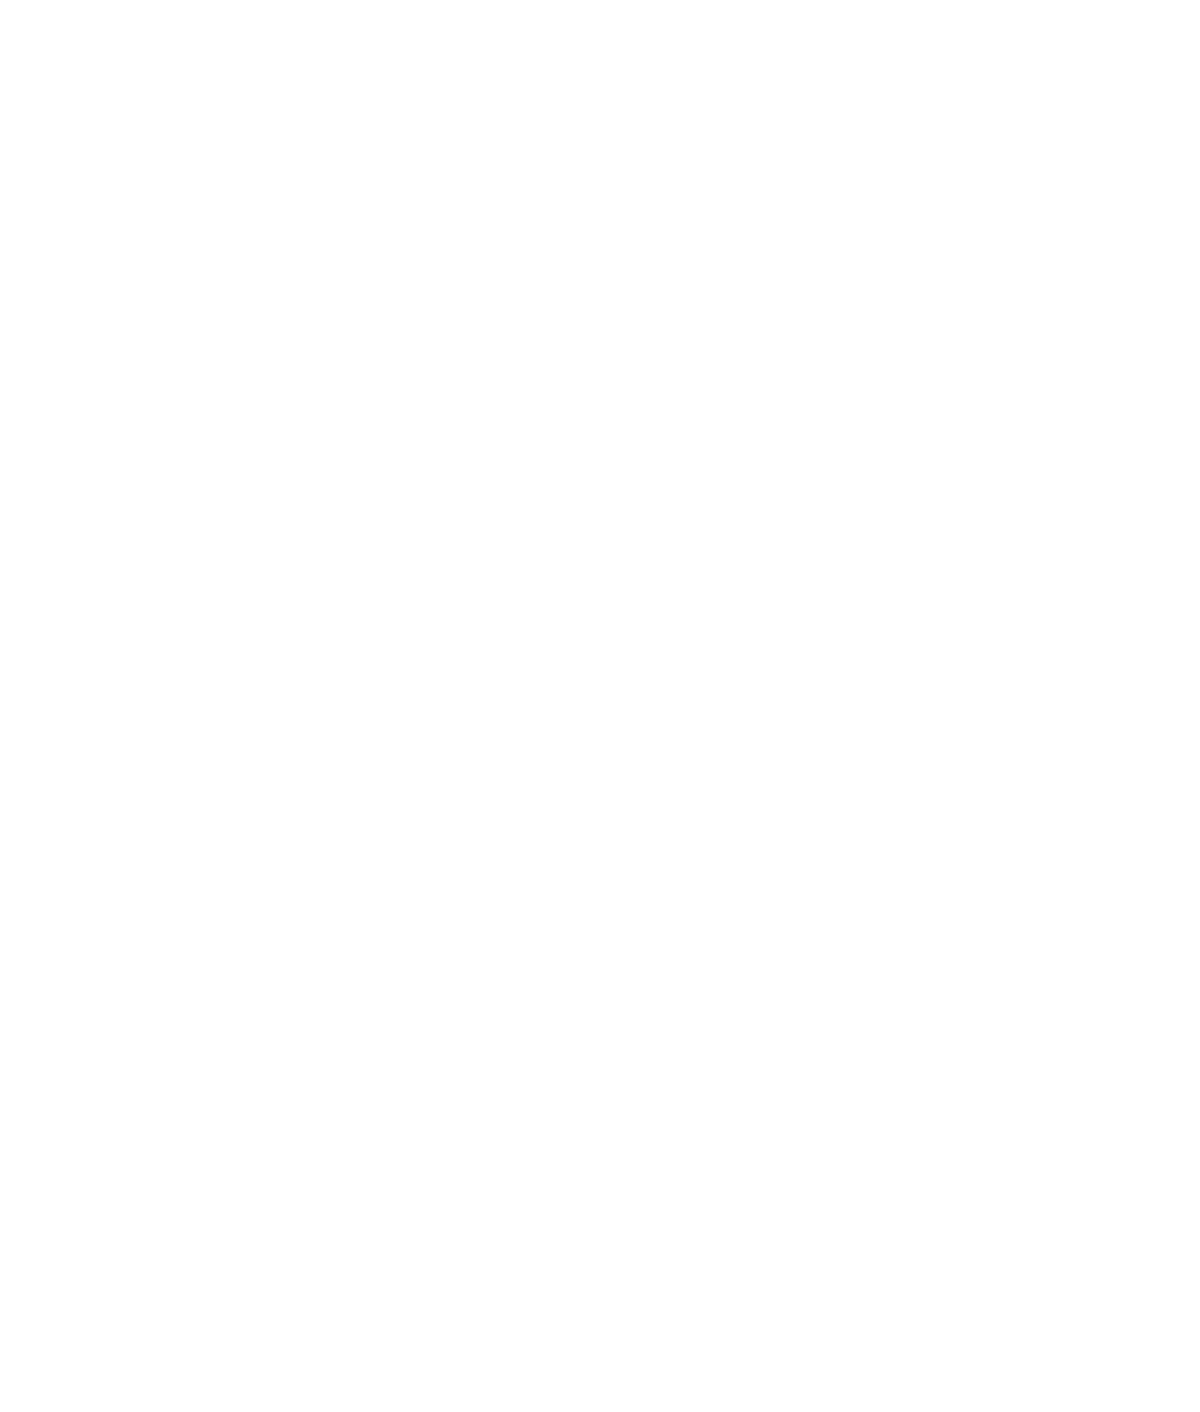 MB70 Drawing